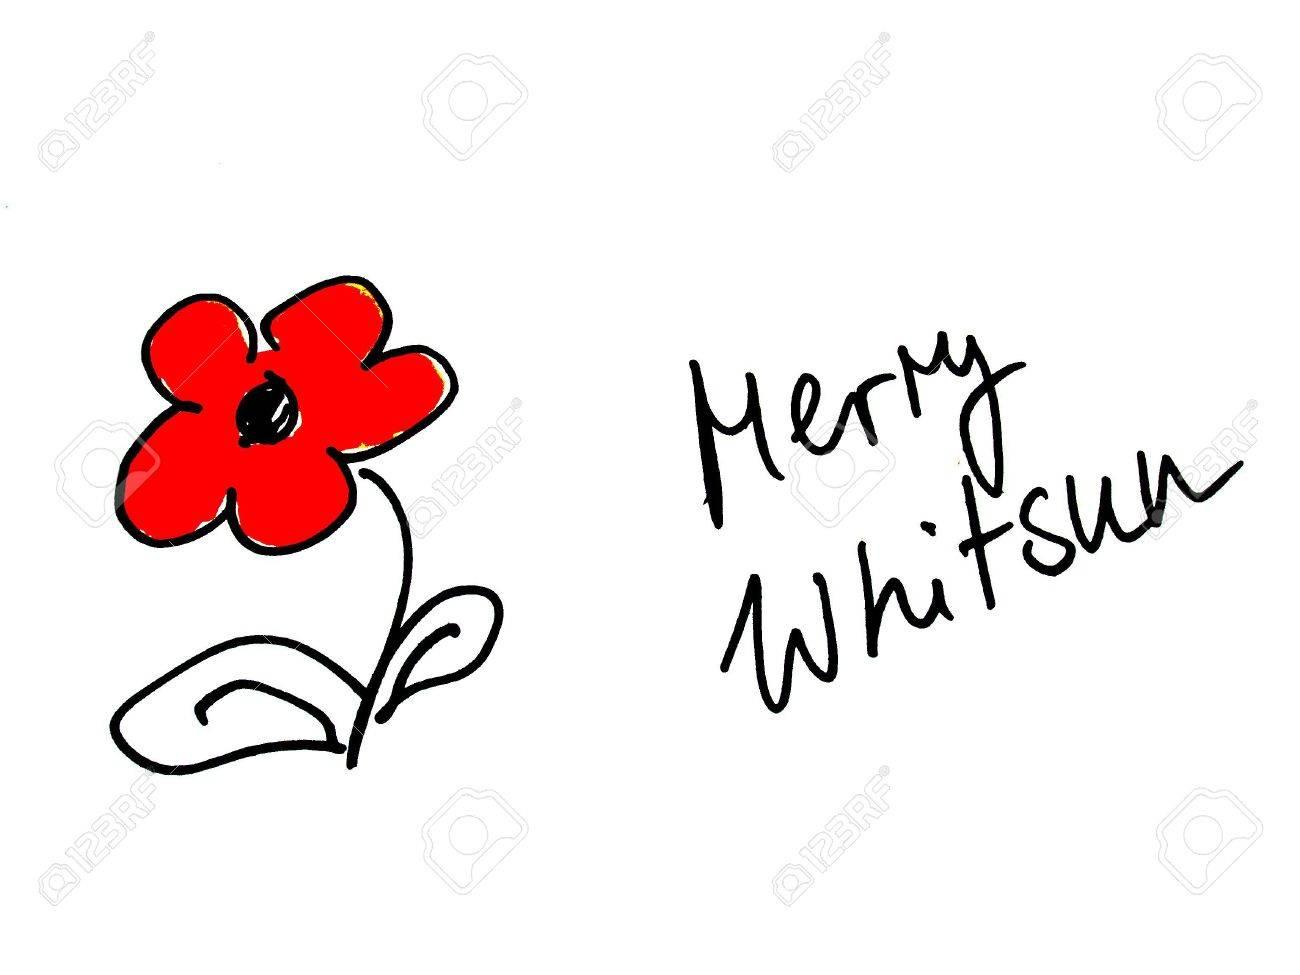 Image result for whitsun